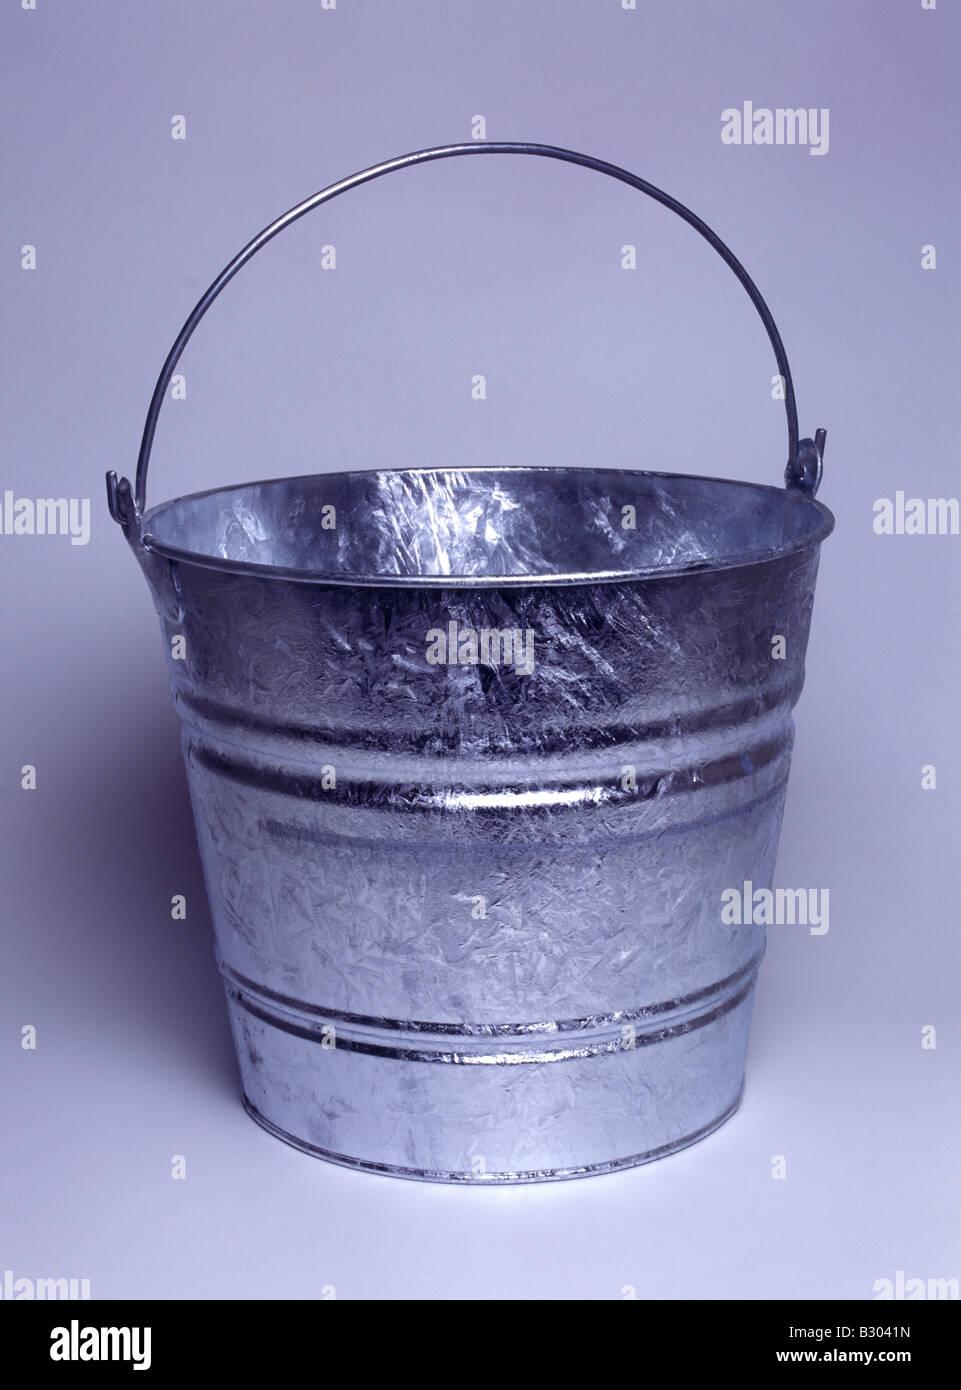 galvanized bucket - Stock Image